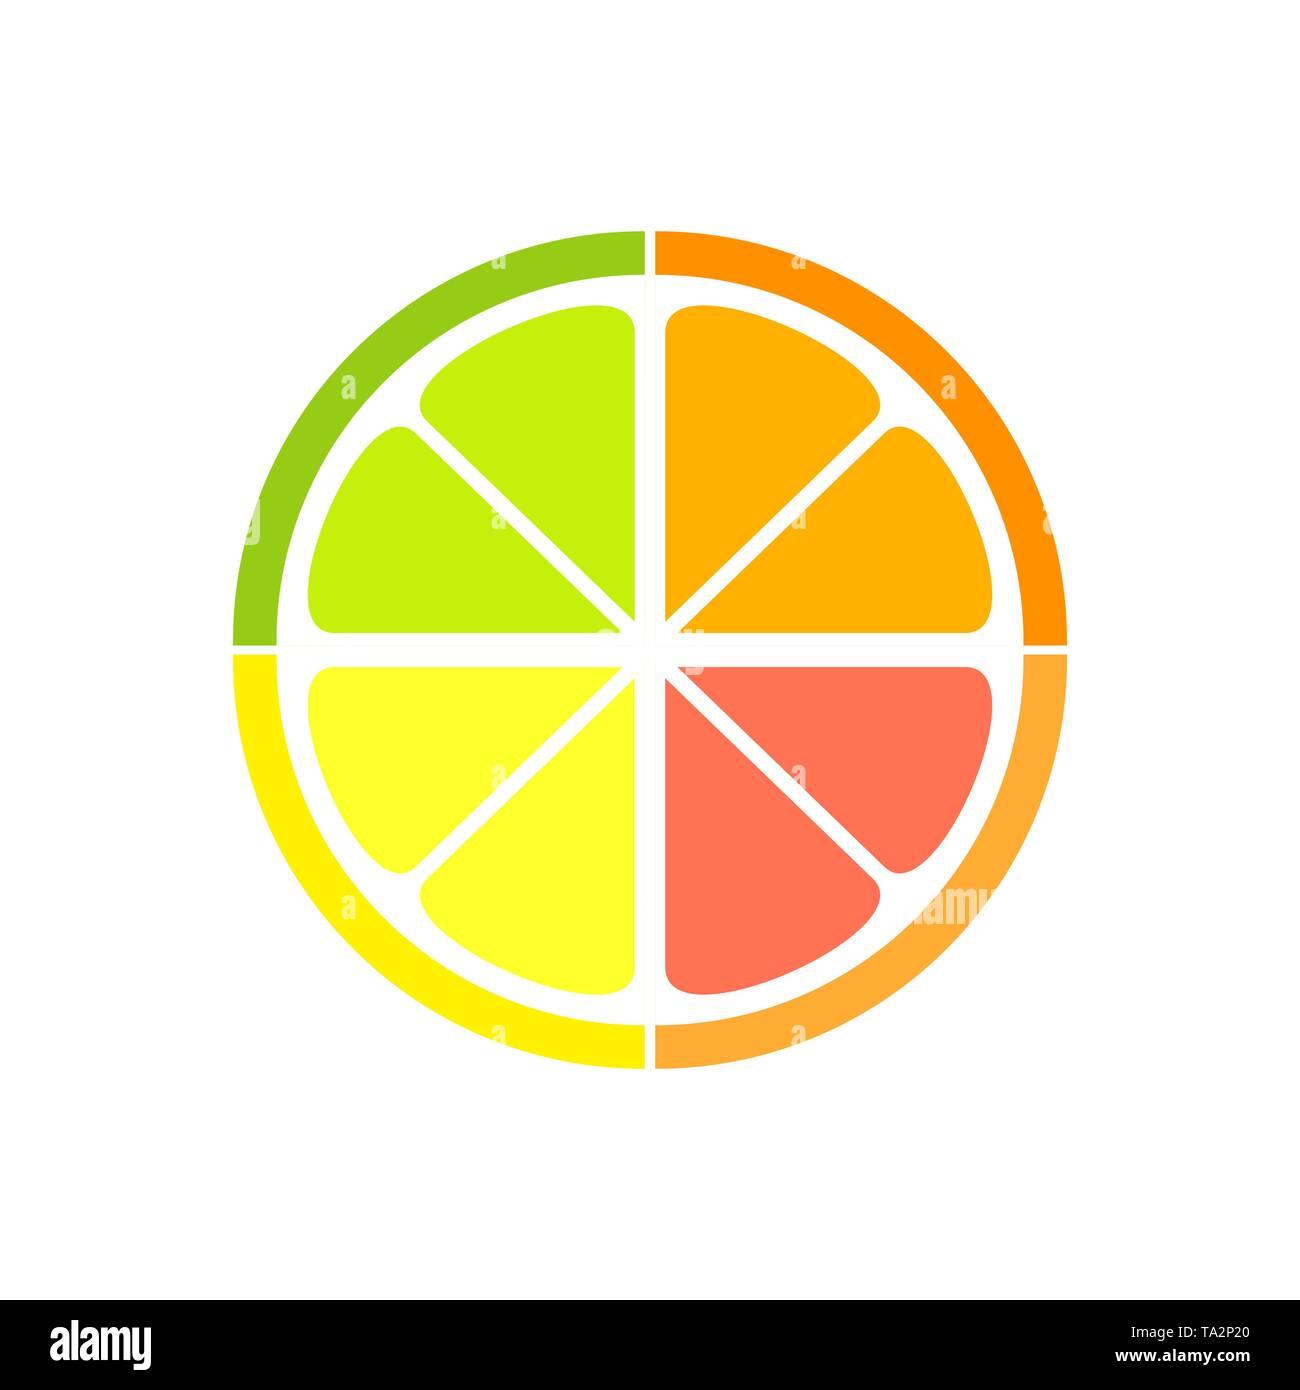 Citrus slice collage icon. Vector illustration - Stock Image